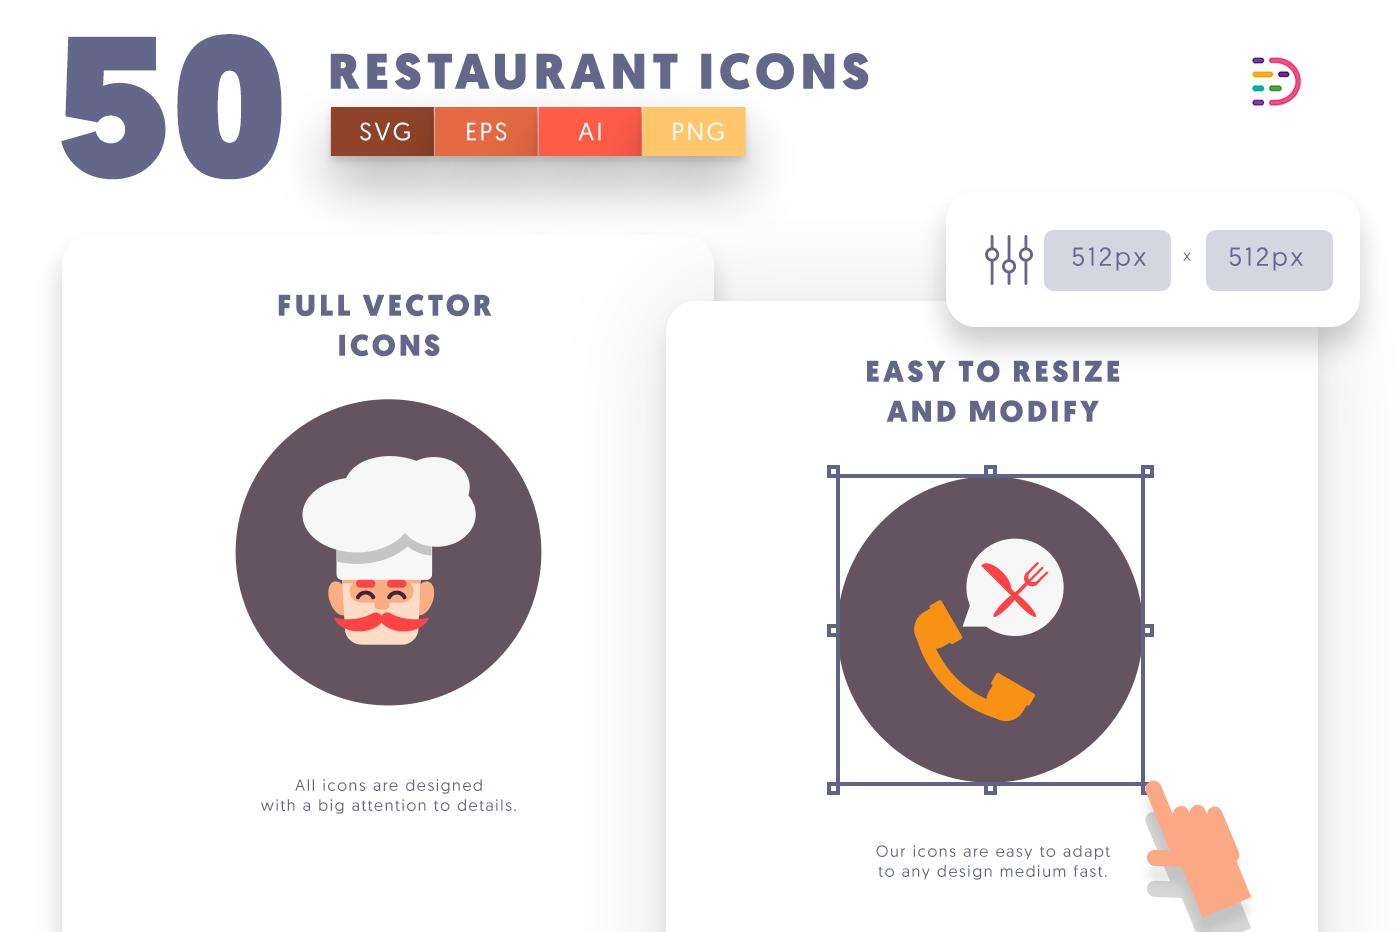 Customizable 50 Restaurant Icons